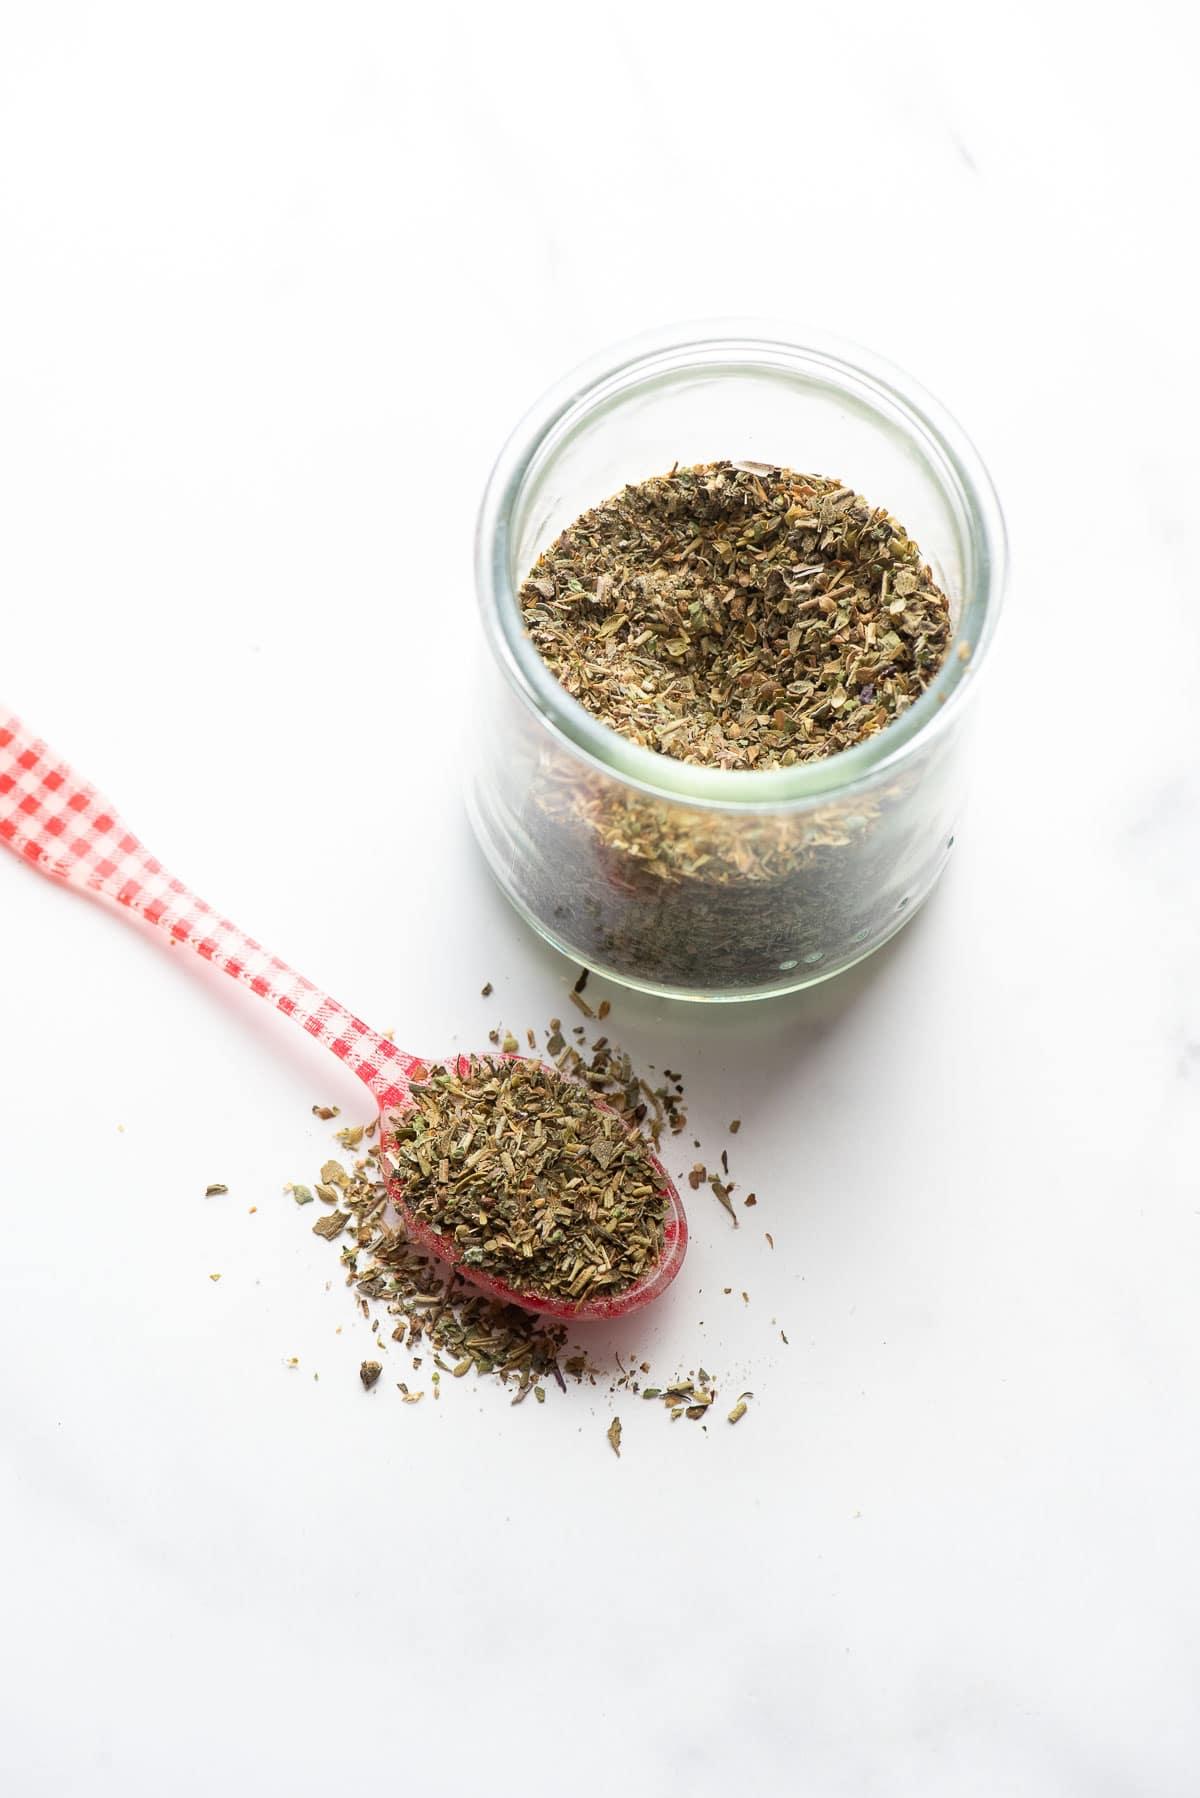 Italian seasoning in jar and on spoon